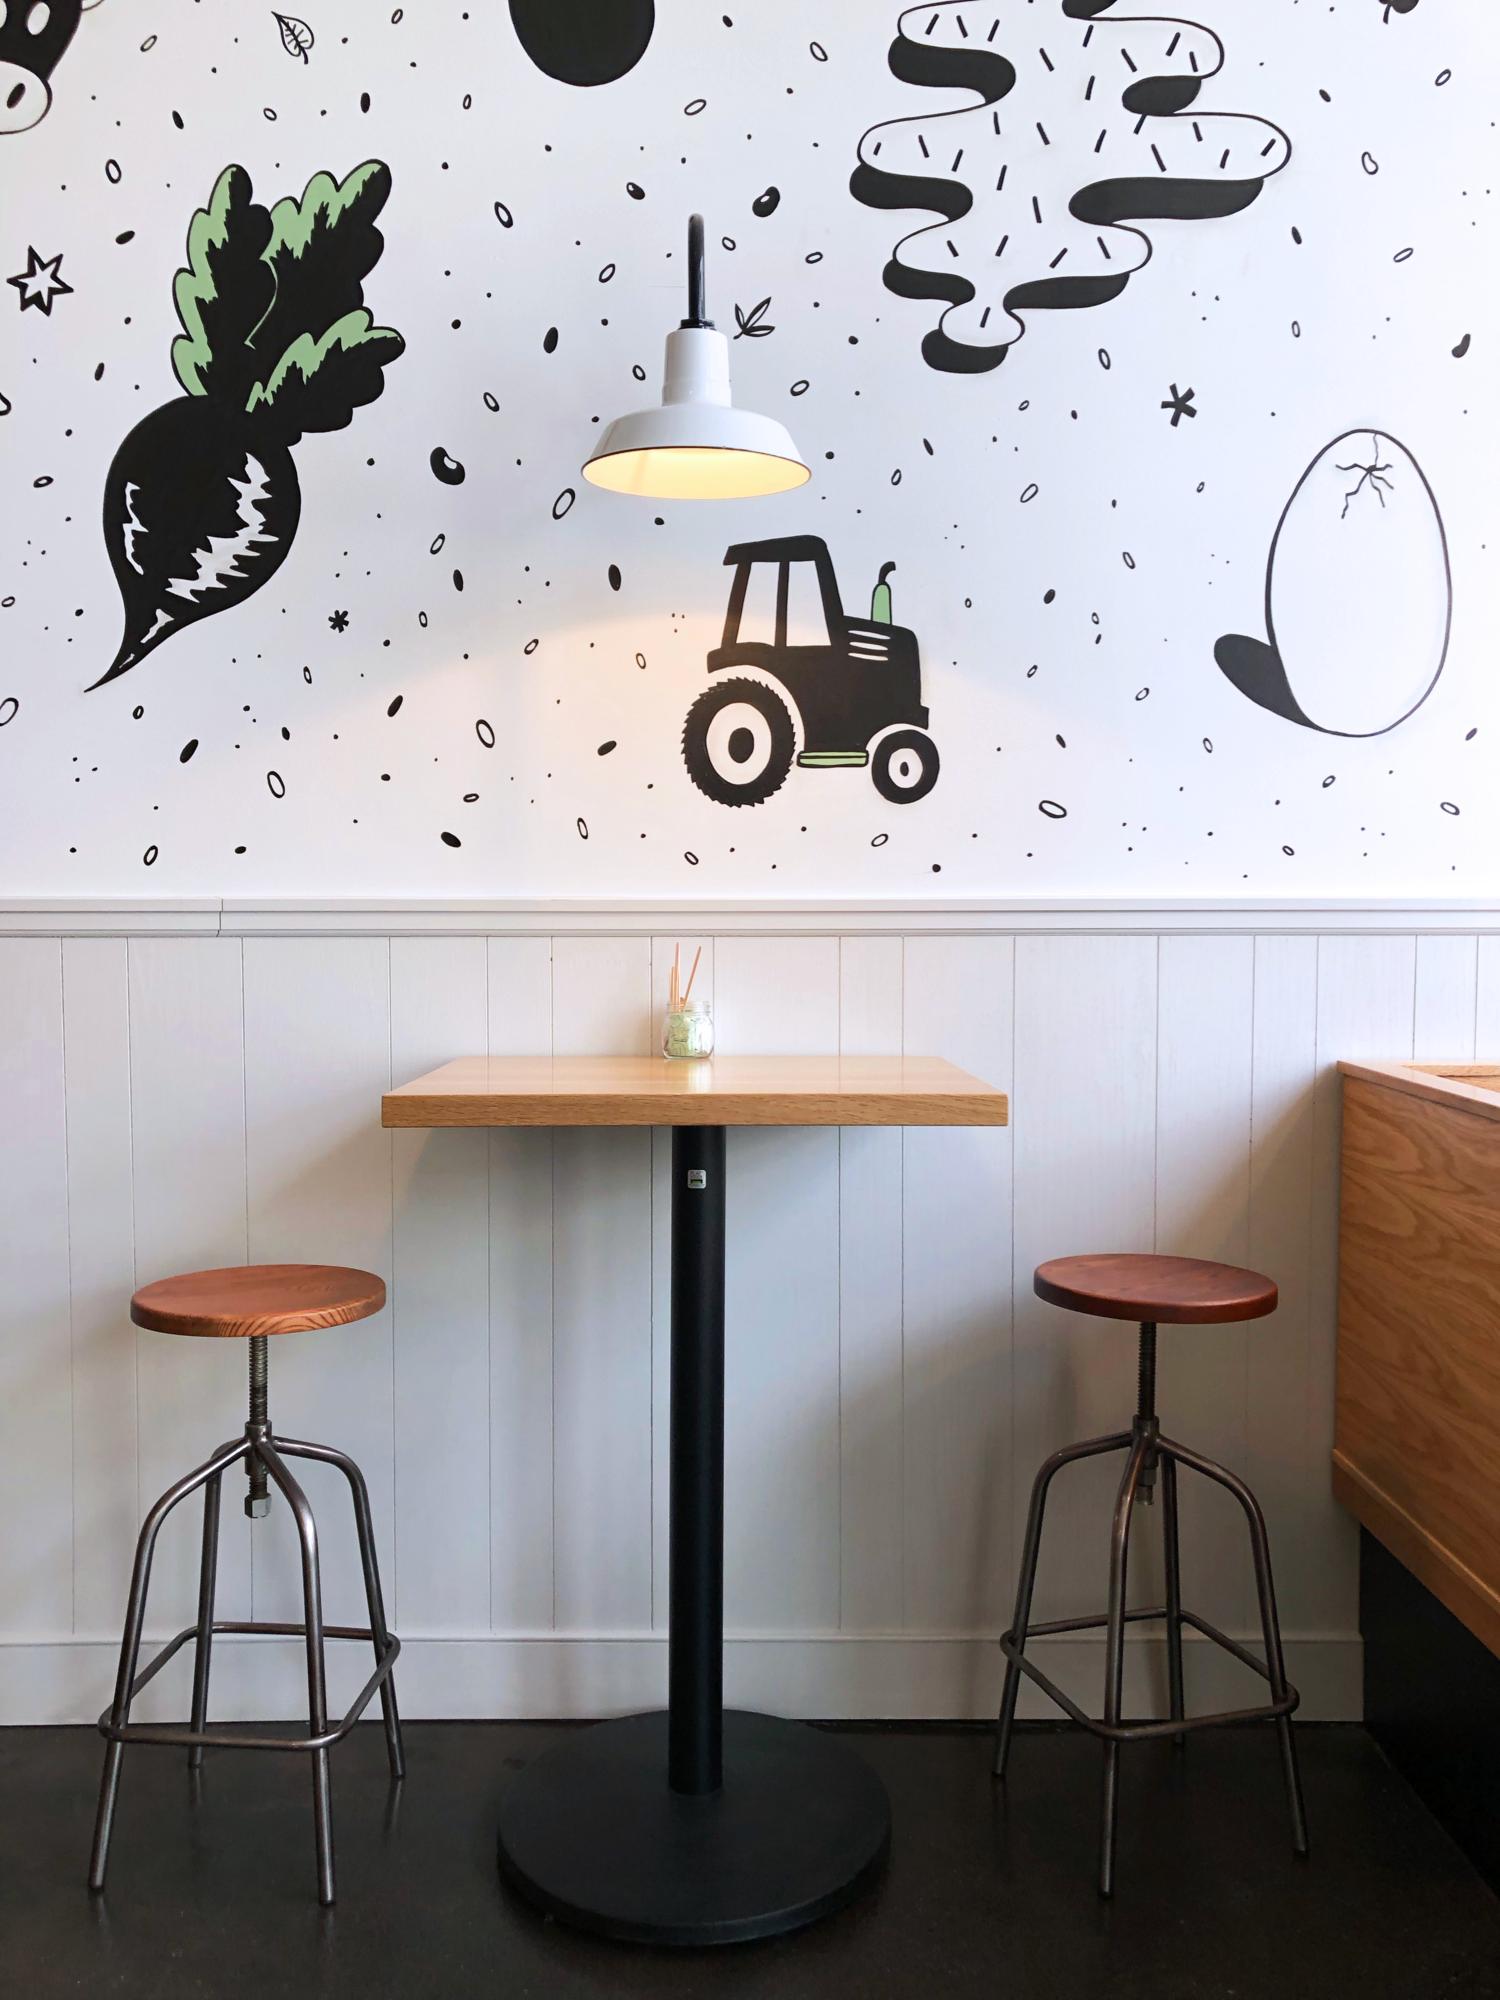 Butterbean Cafe Case Study Branding Web Design Interior